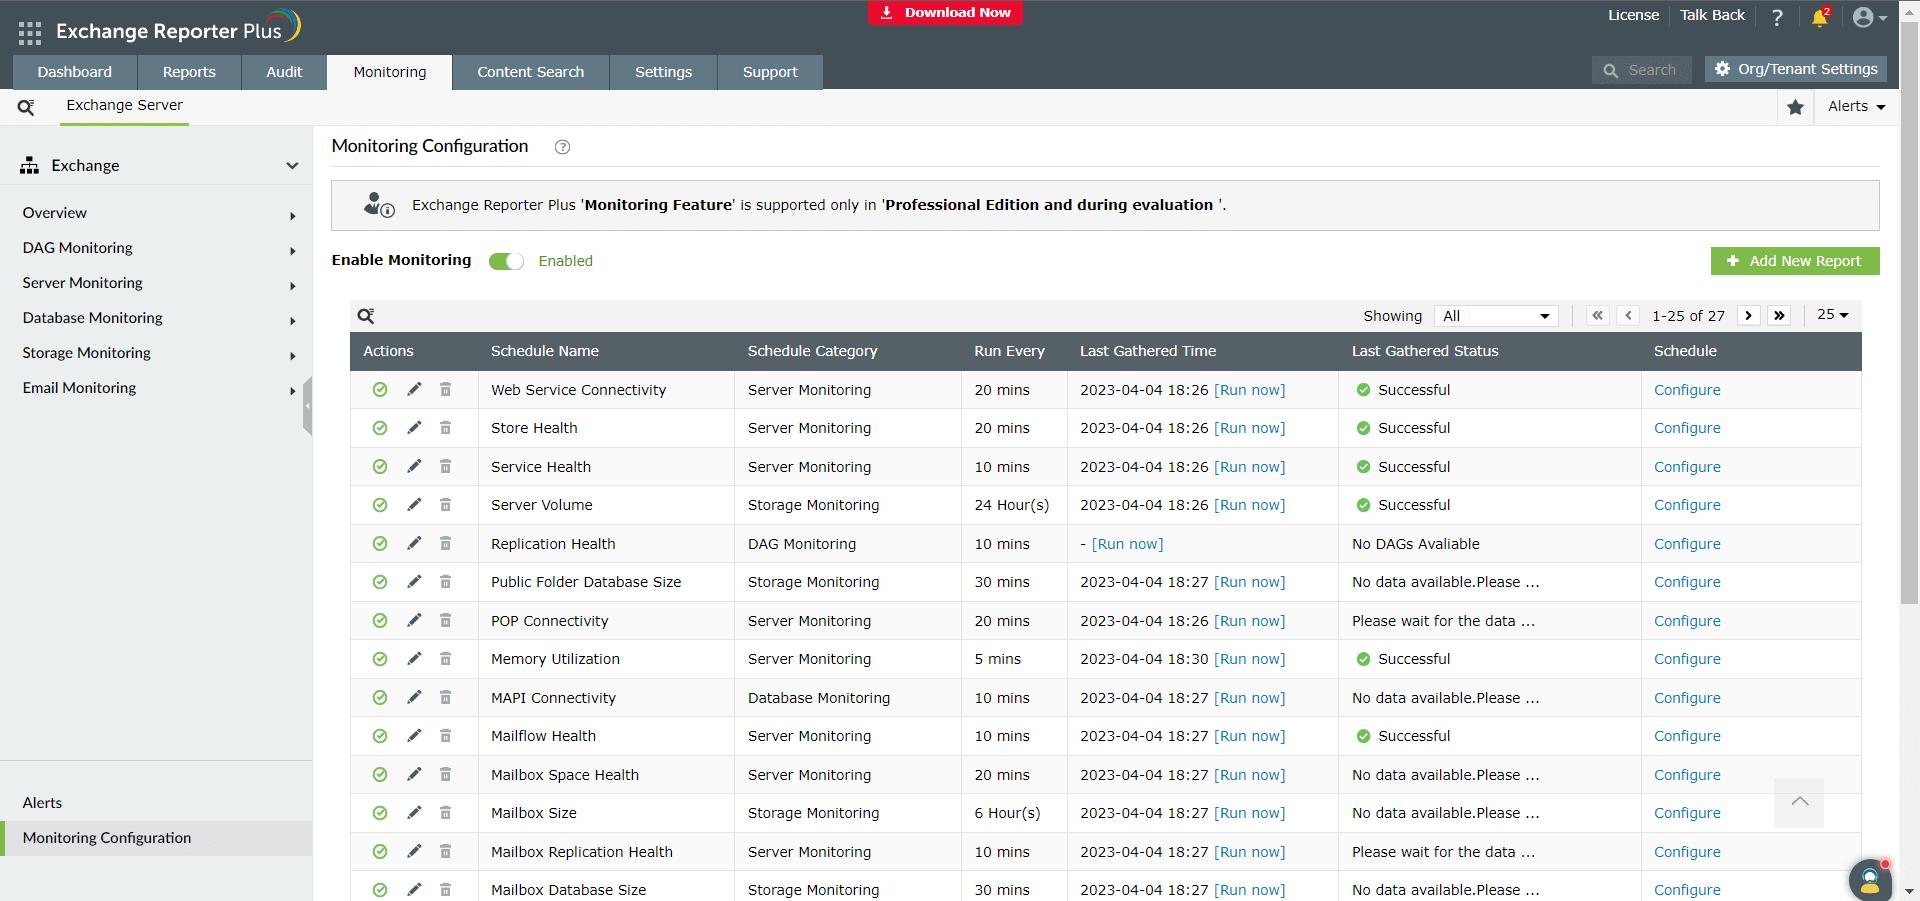 customizing-alert-profiles